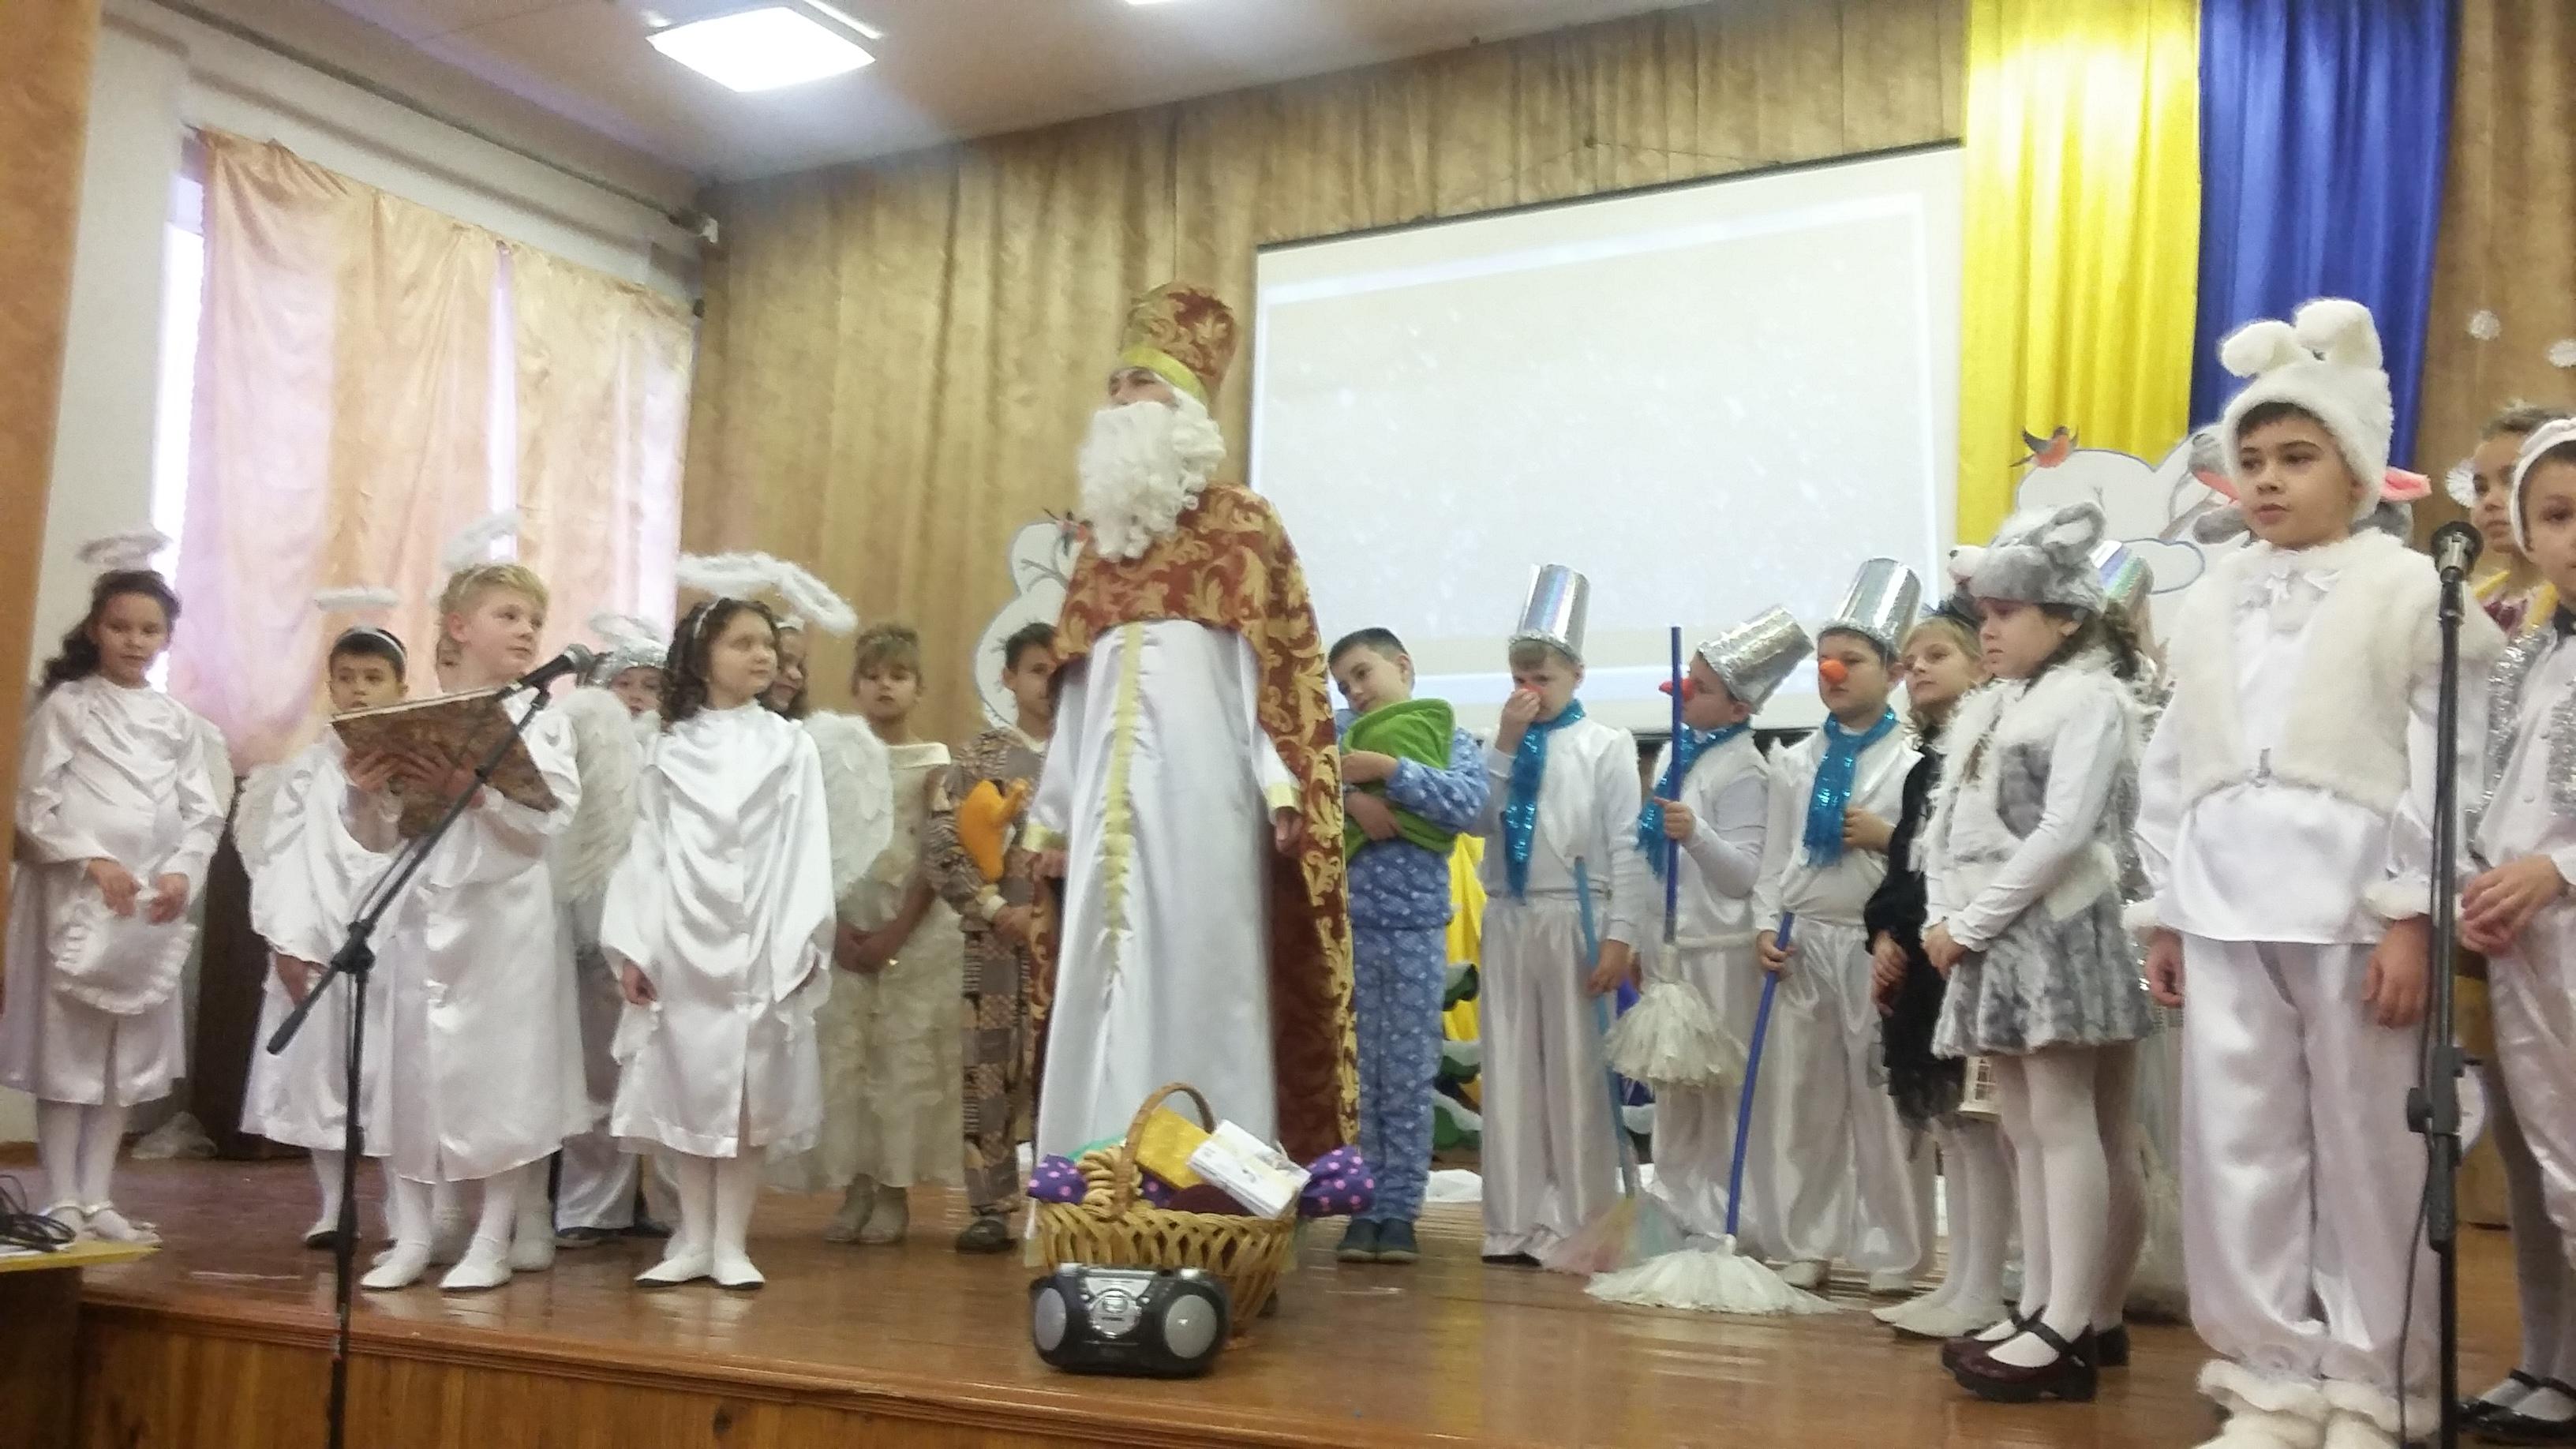 http://karl-gymnasium.at.ua/2a/20171219_094711.jpg